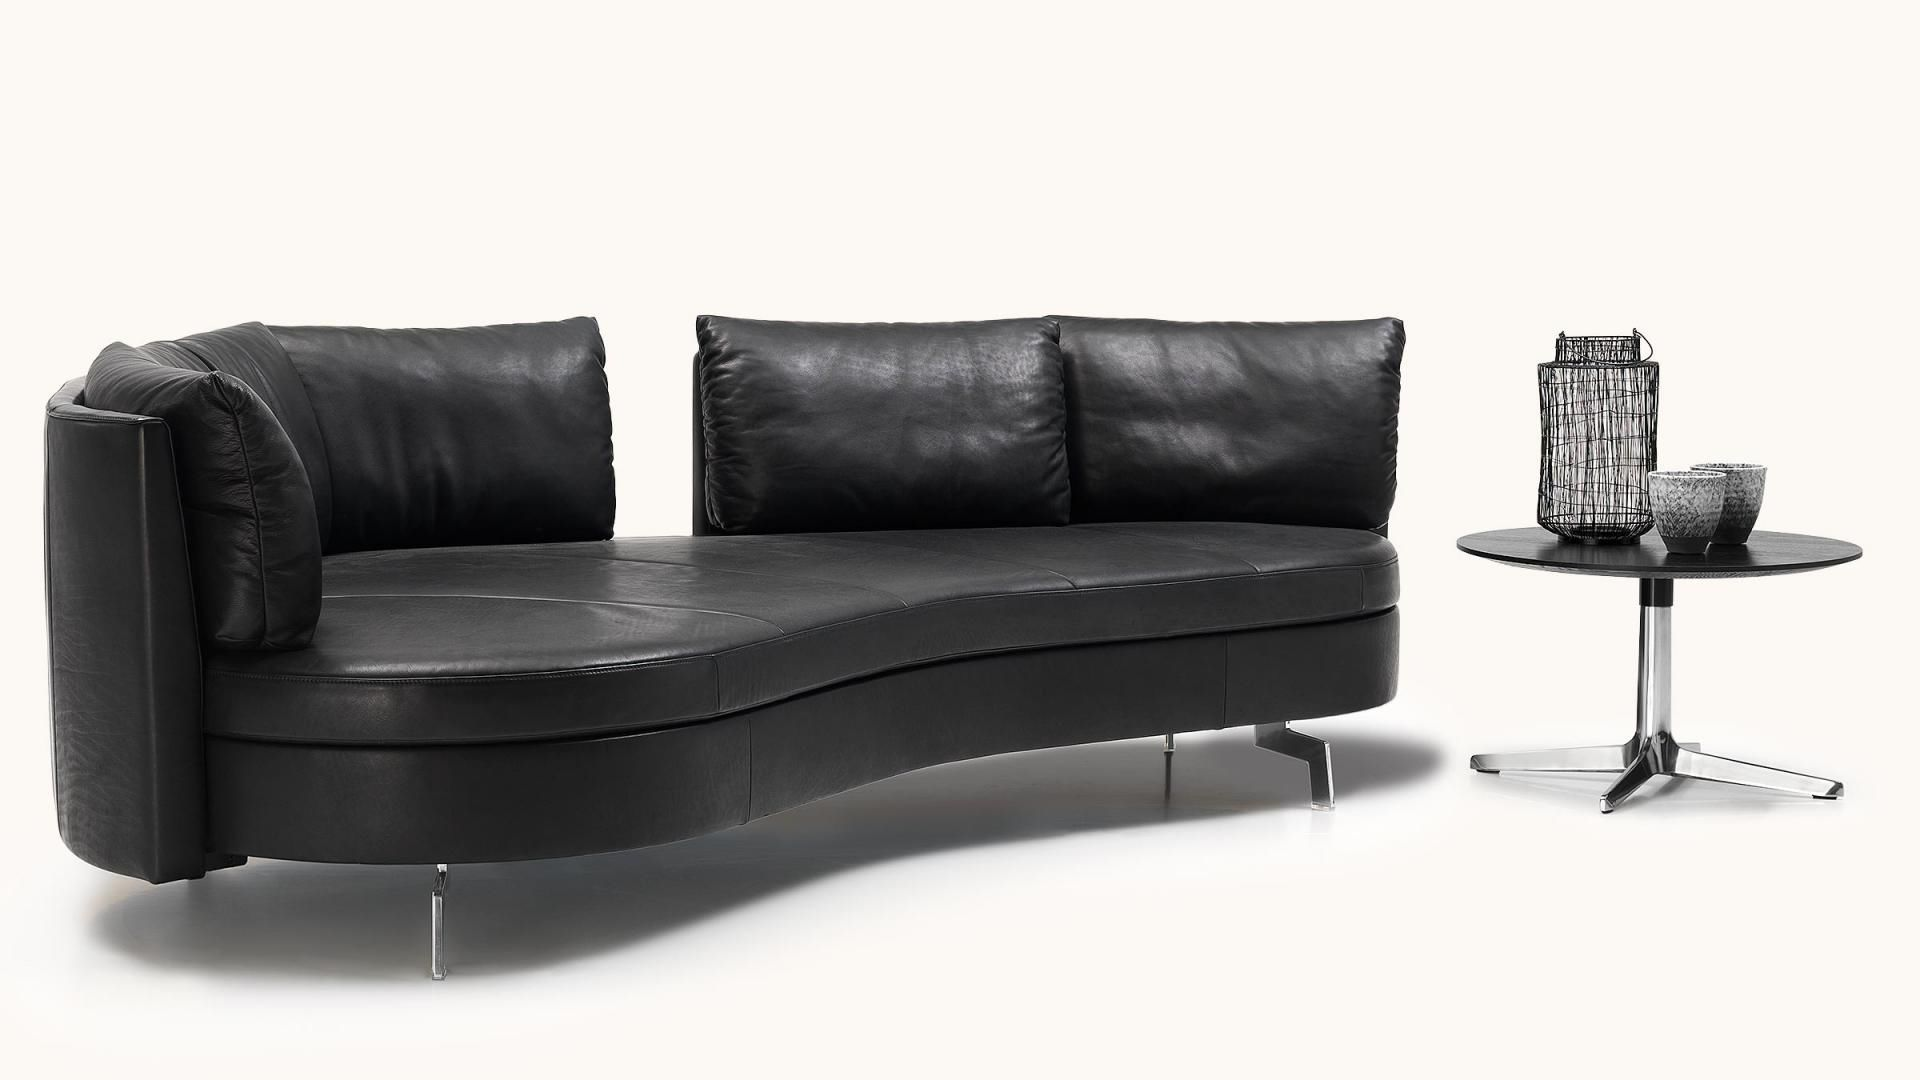 images?q=tbn:ANd9GcQh_l3eQ5xwiPy07kGEXjmjgmBKBRB7H2mRxCGhv1tFWg5c_mWT Couch Halbrund